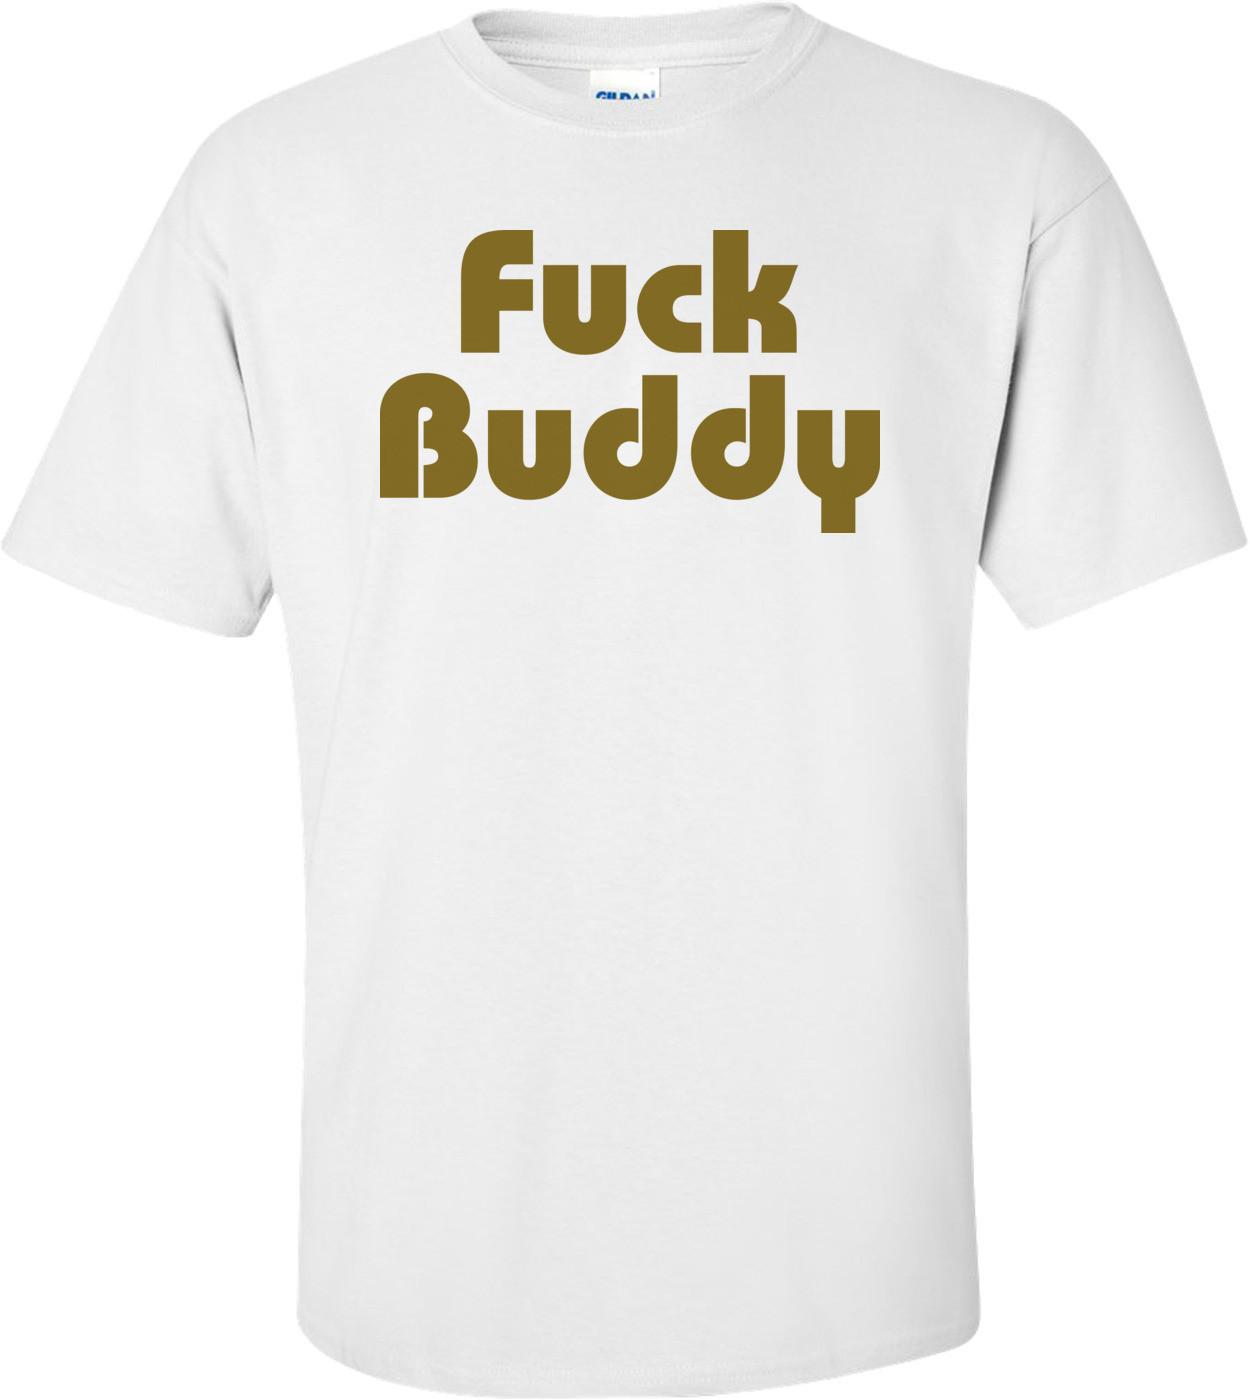 Fuck Buddy T-shirt